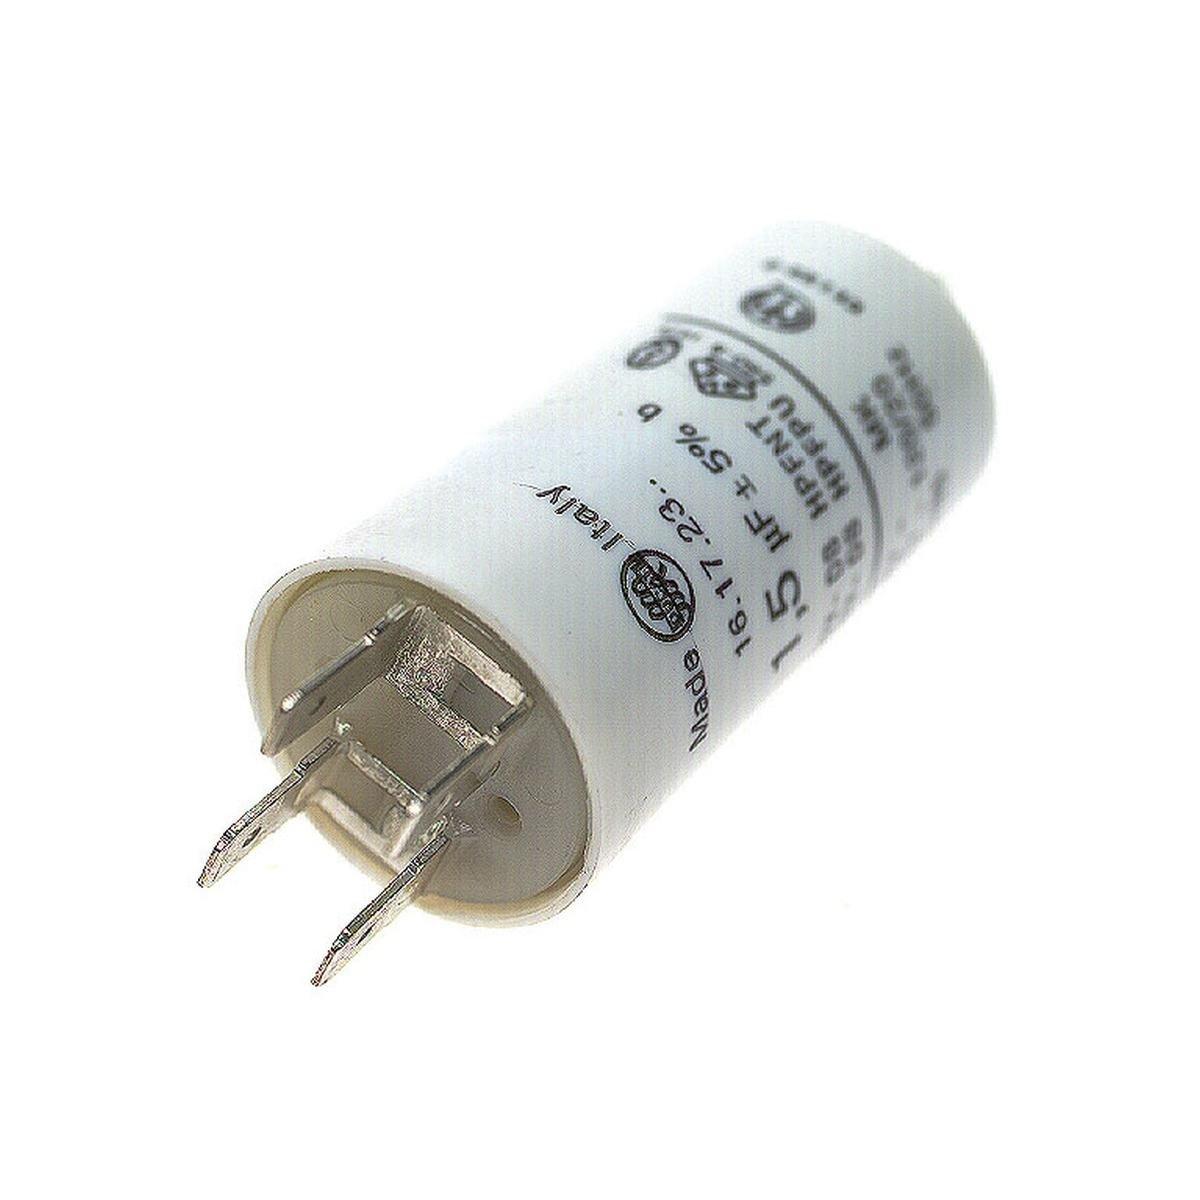 Kondensator 16,0 µF 450V